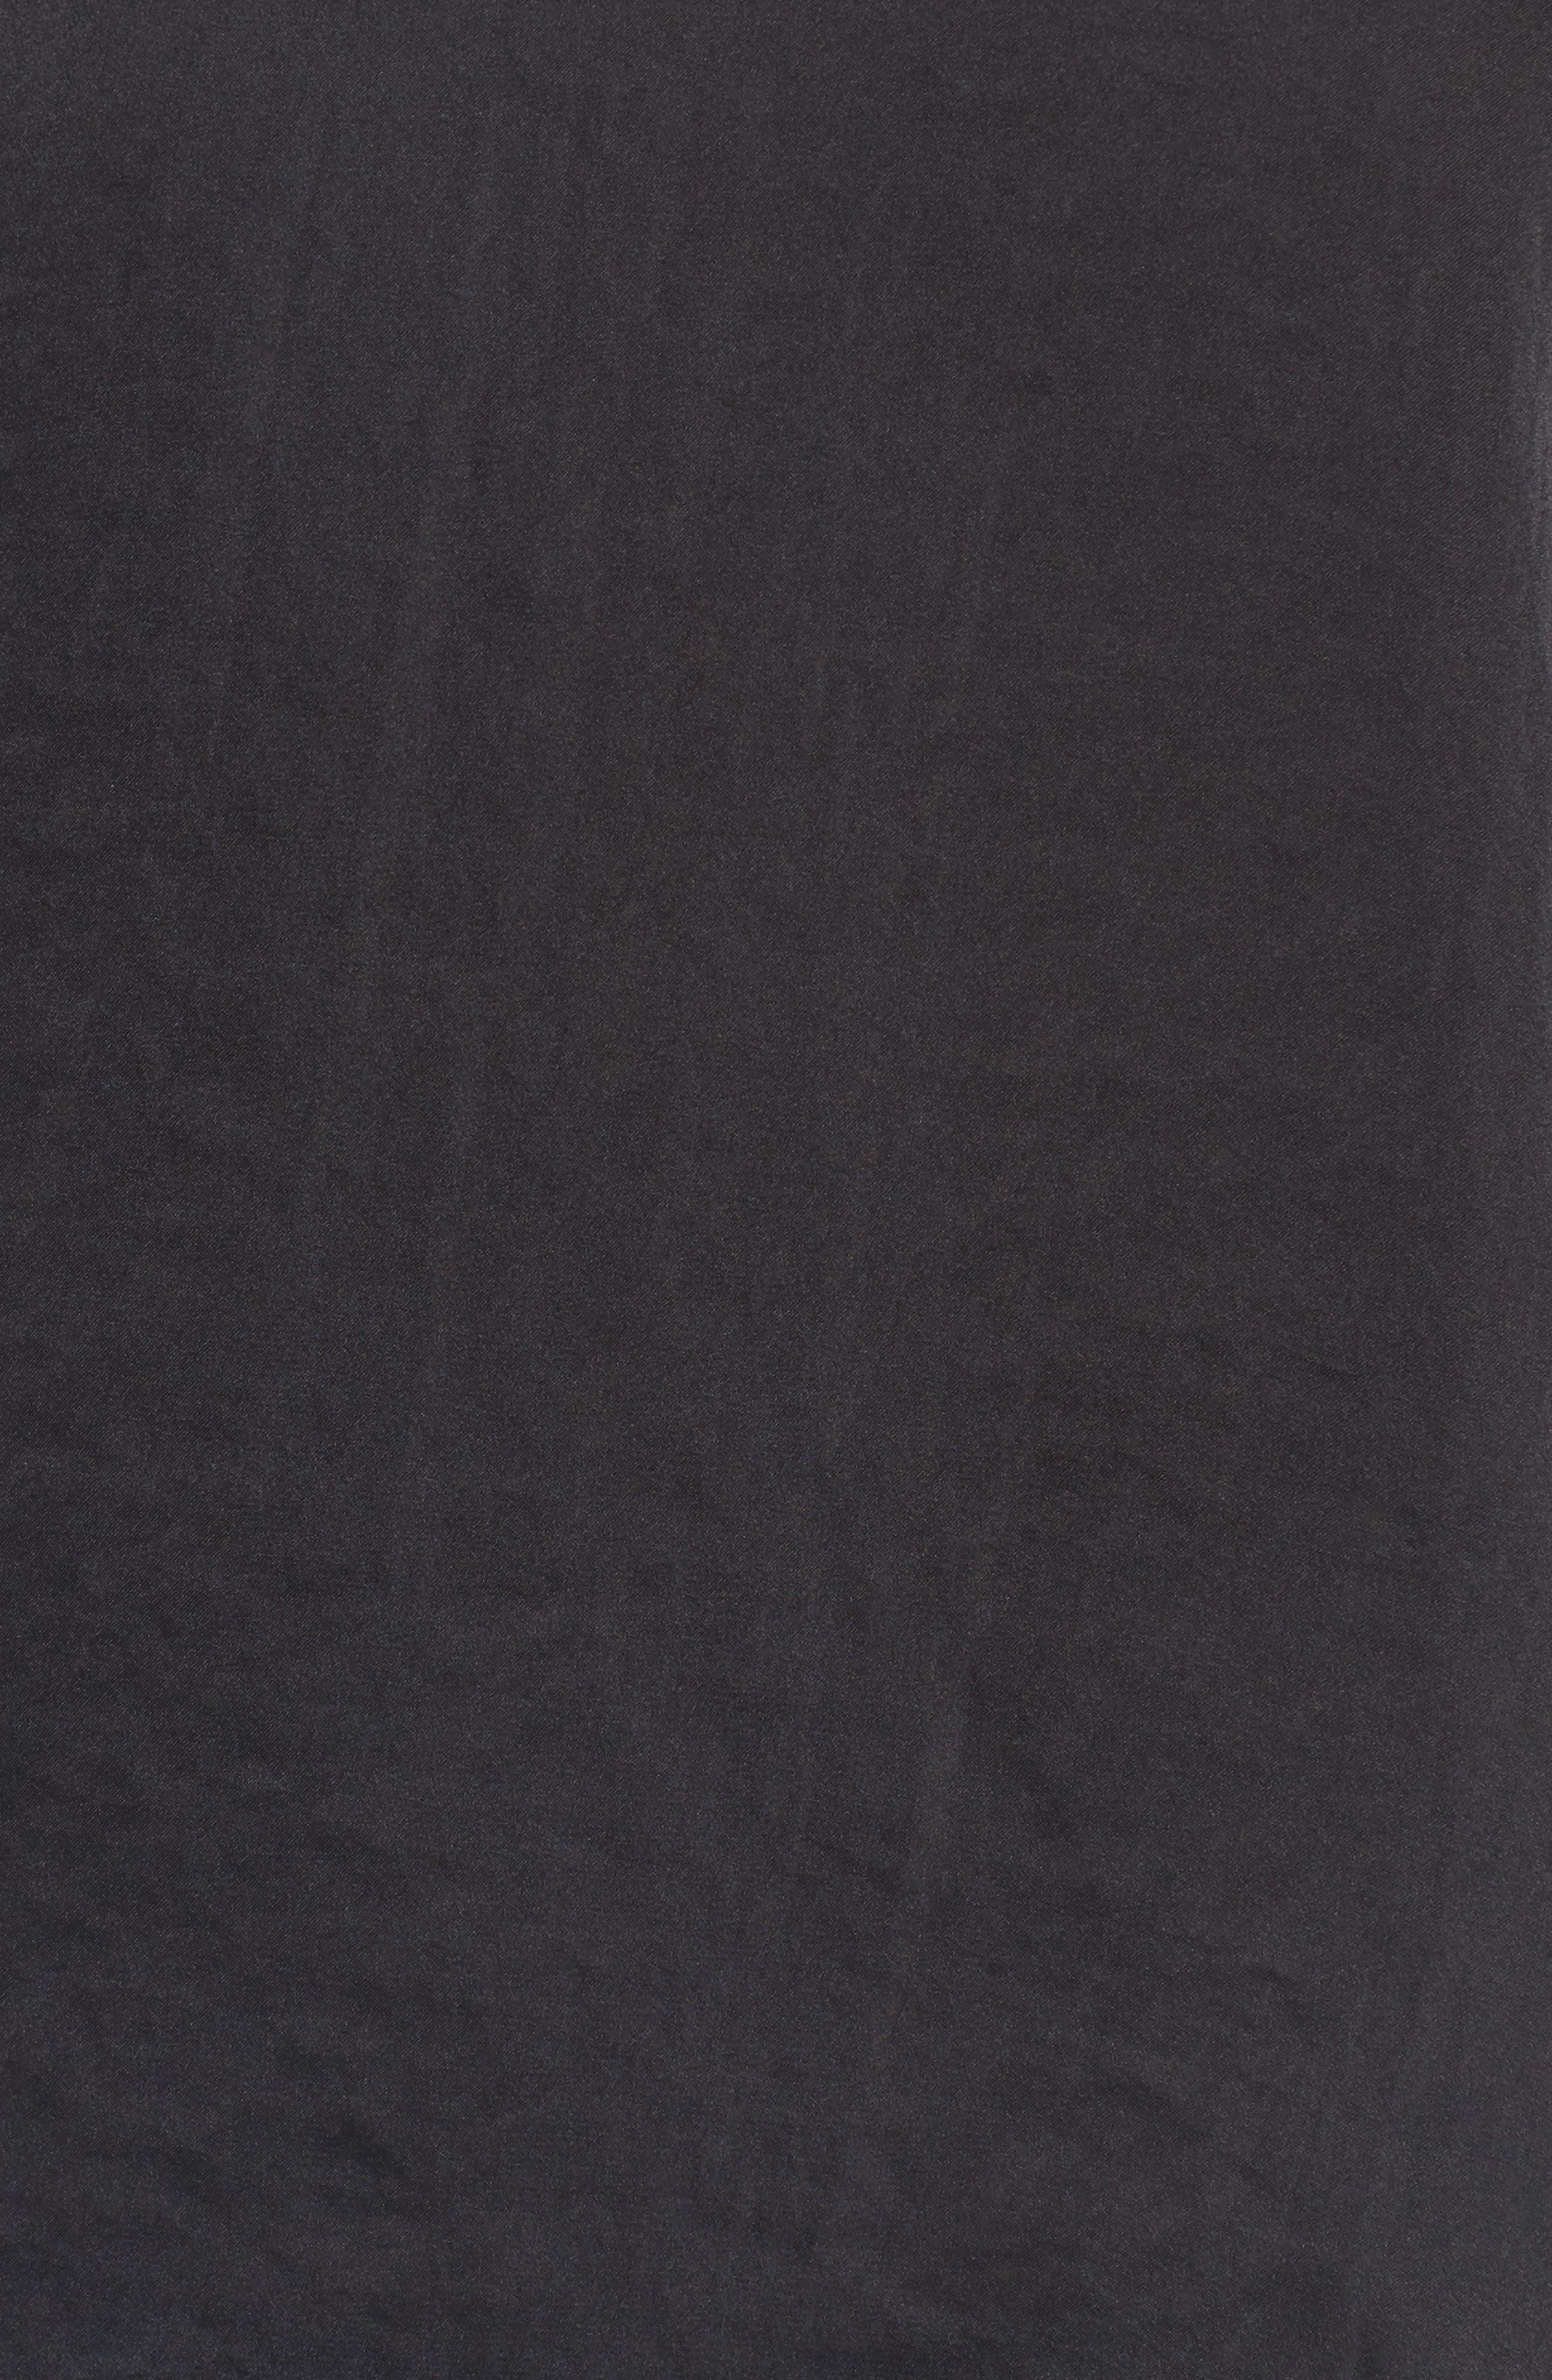 Drape Ruffle Camisole,                             Alternate thumbnail 5, color,                             001